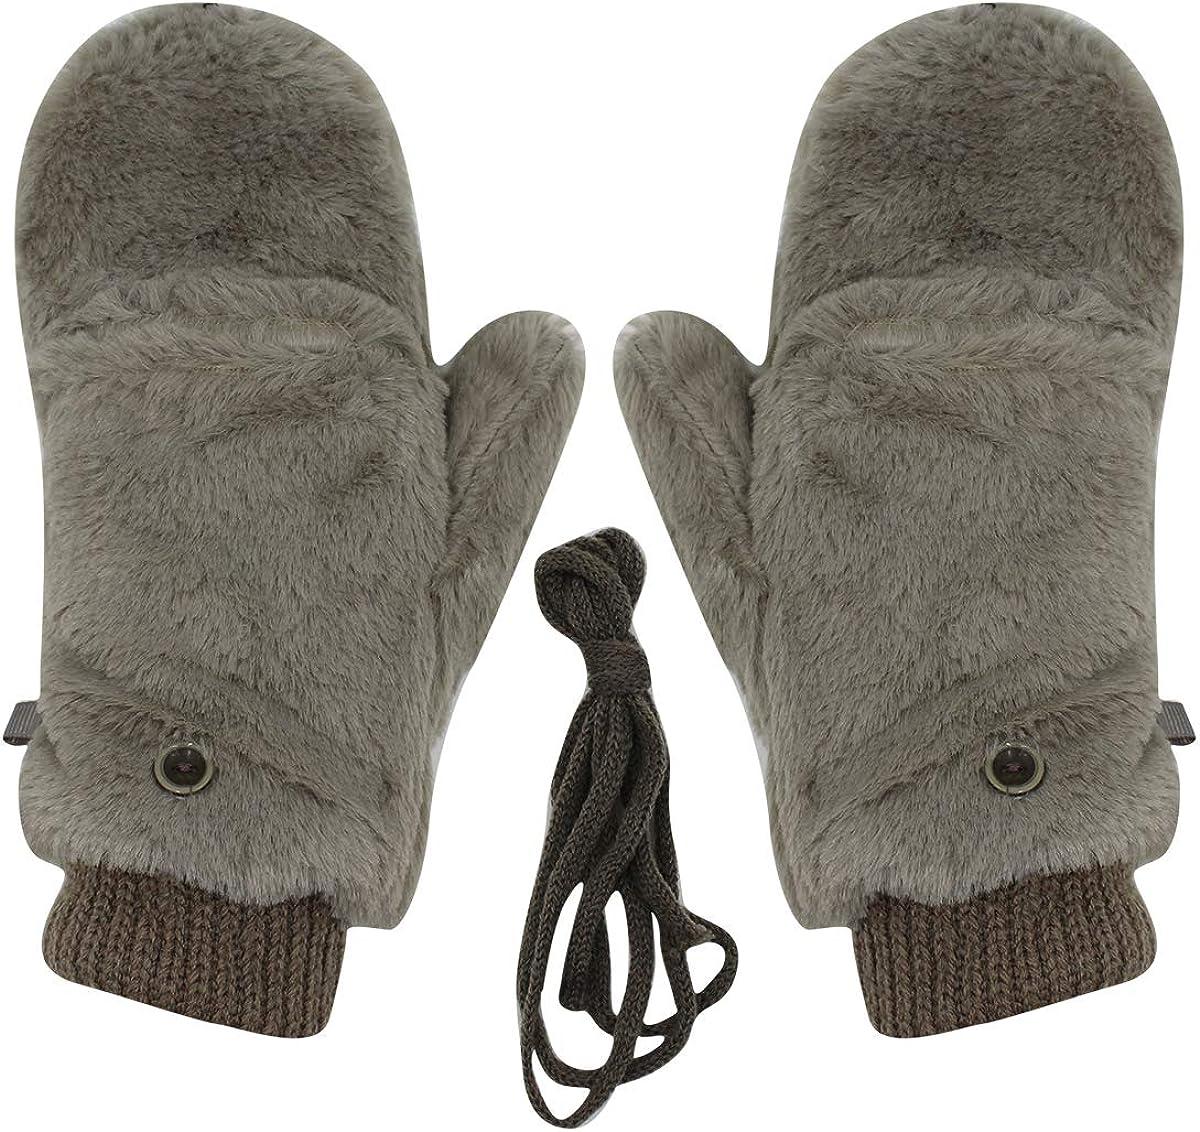 Unisex Winter Fluffy Gloves Mittens Windproof Fleece Plush Gloves with Warm Mitten Cover for Women Girls Boys